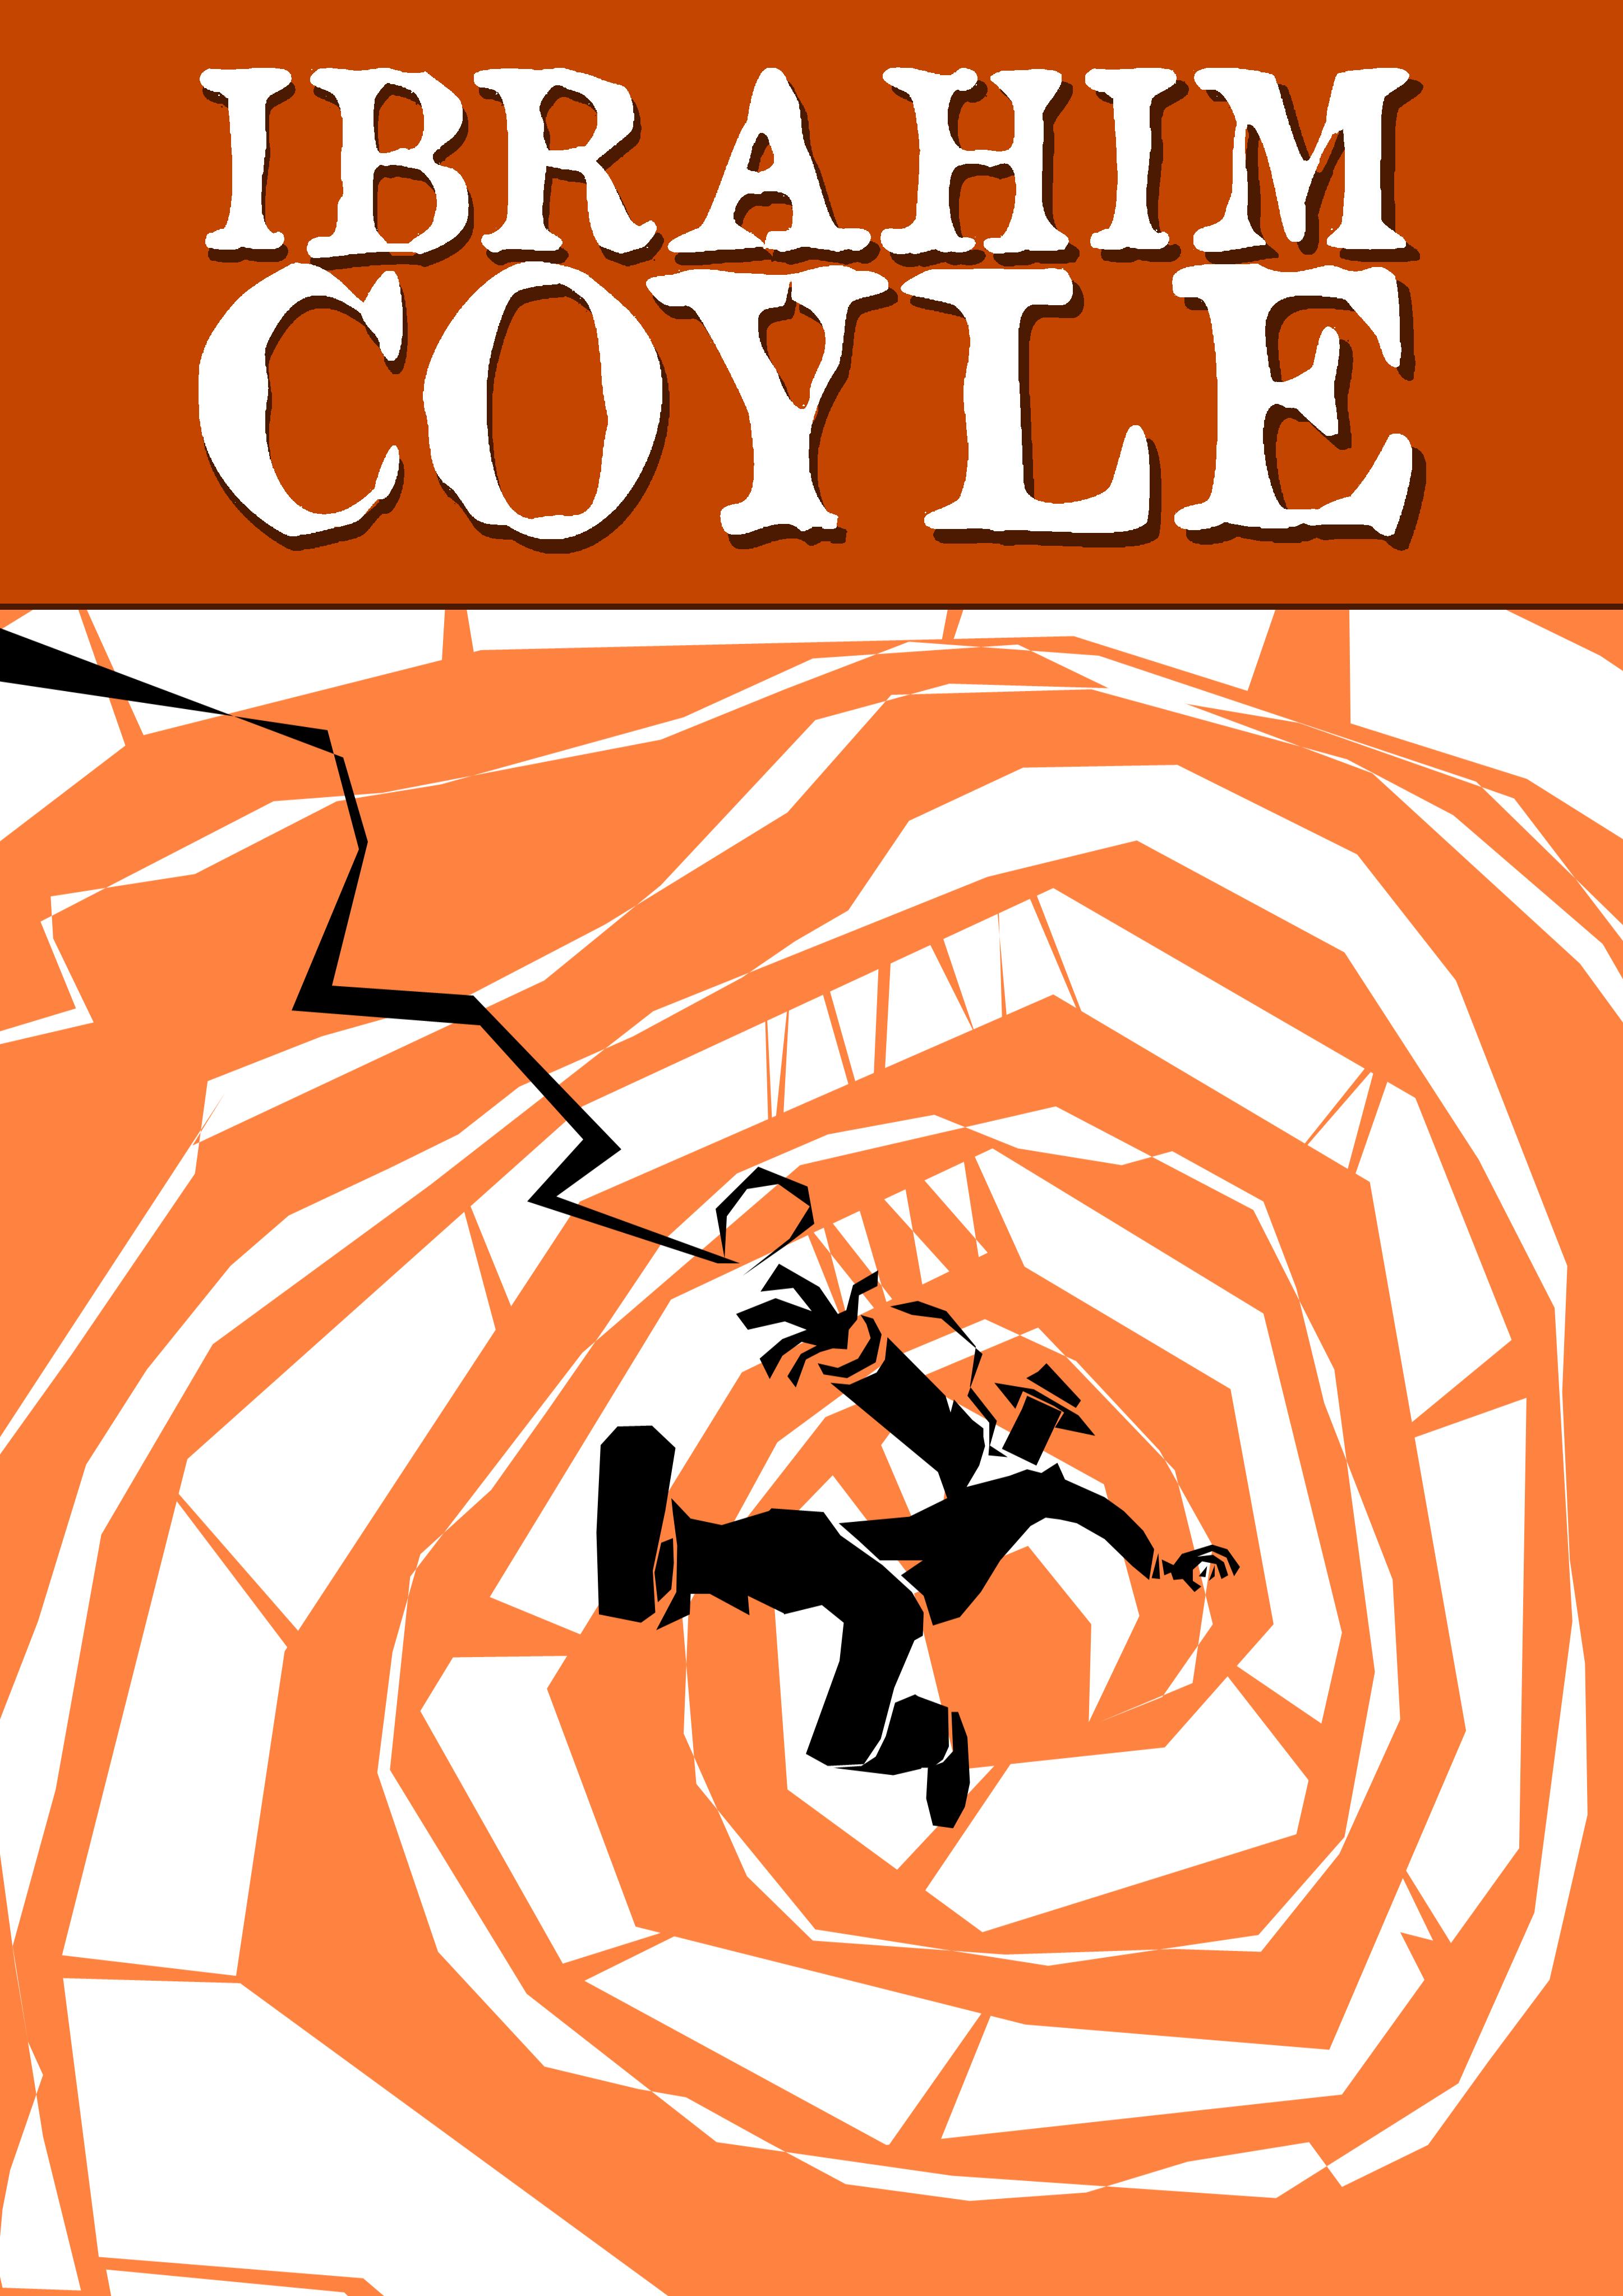 Ibrahim Coyle #9